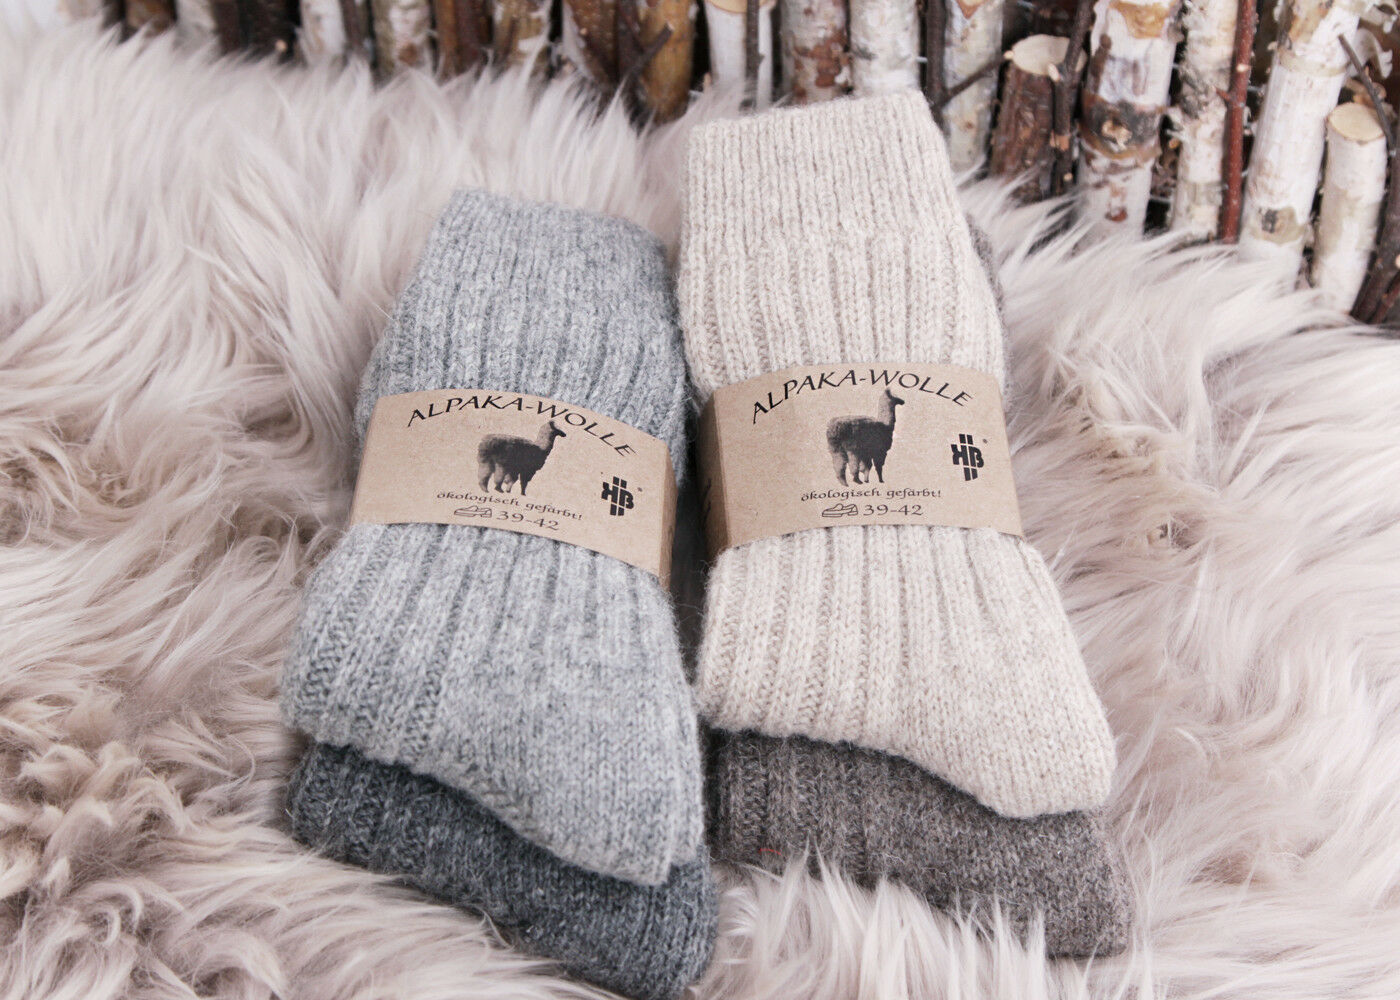 2Paar Alpaka Natur Socken Wollsocken 100% Wolle Herren Damen dick dünn gestrickt